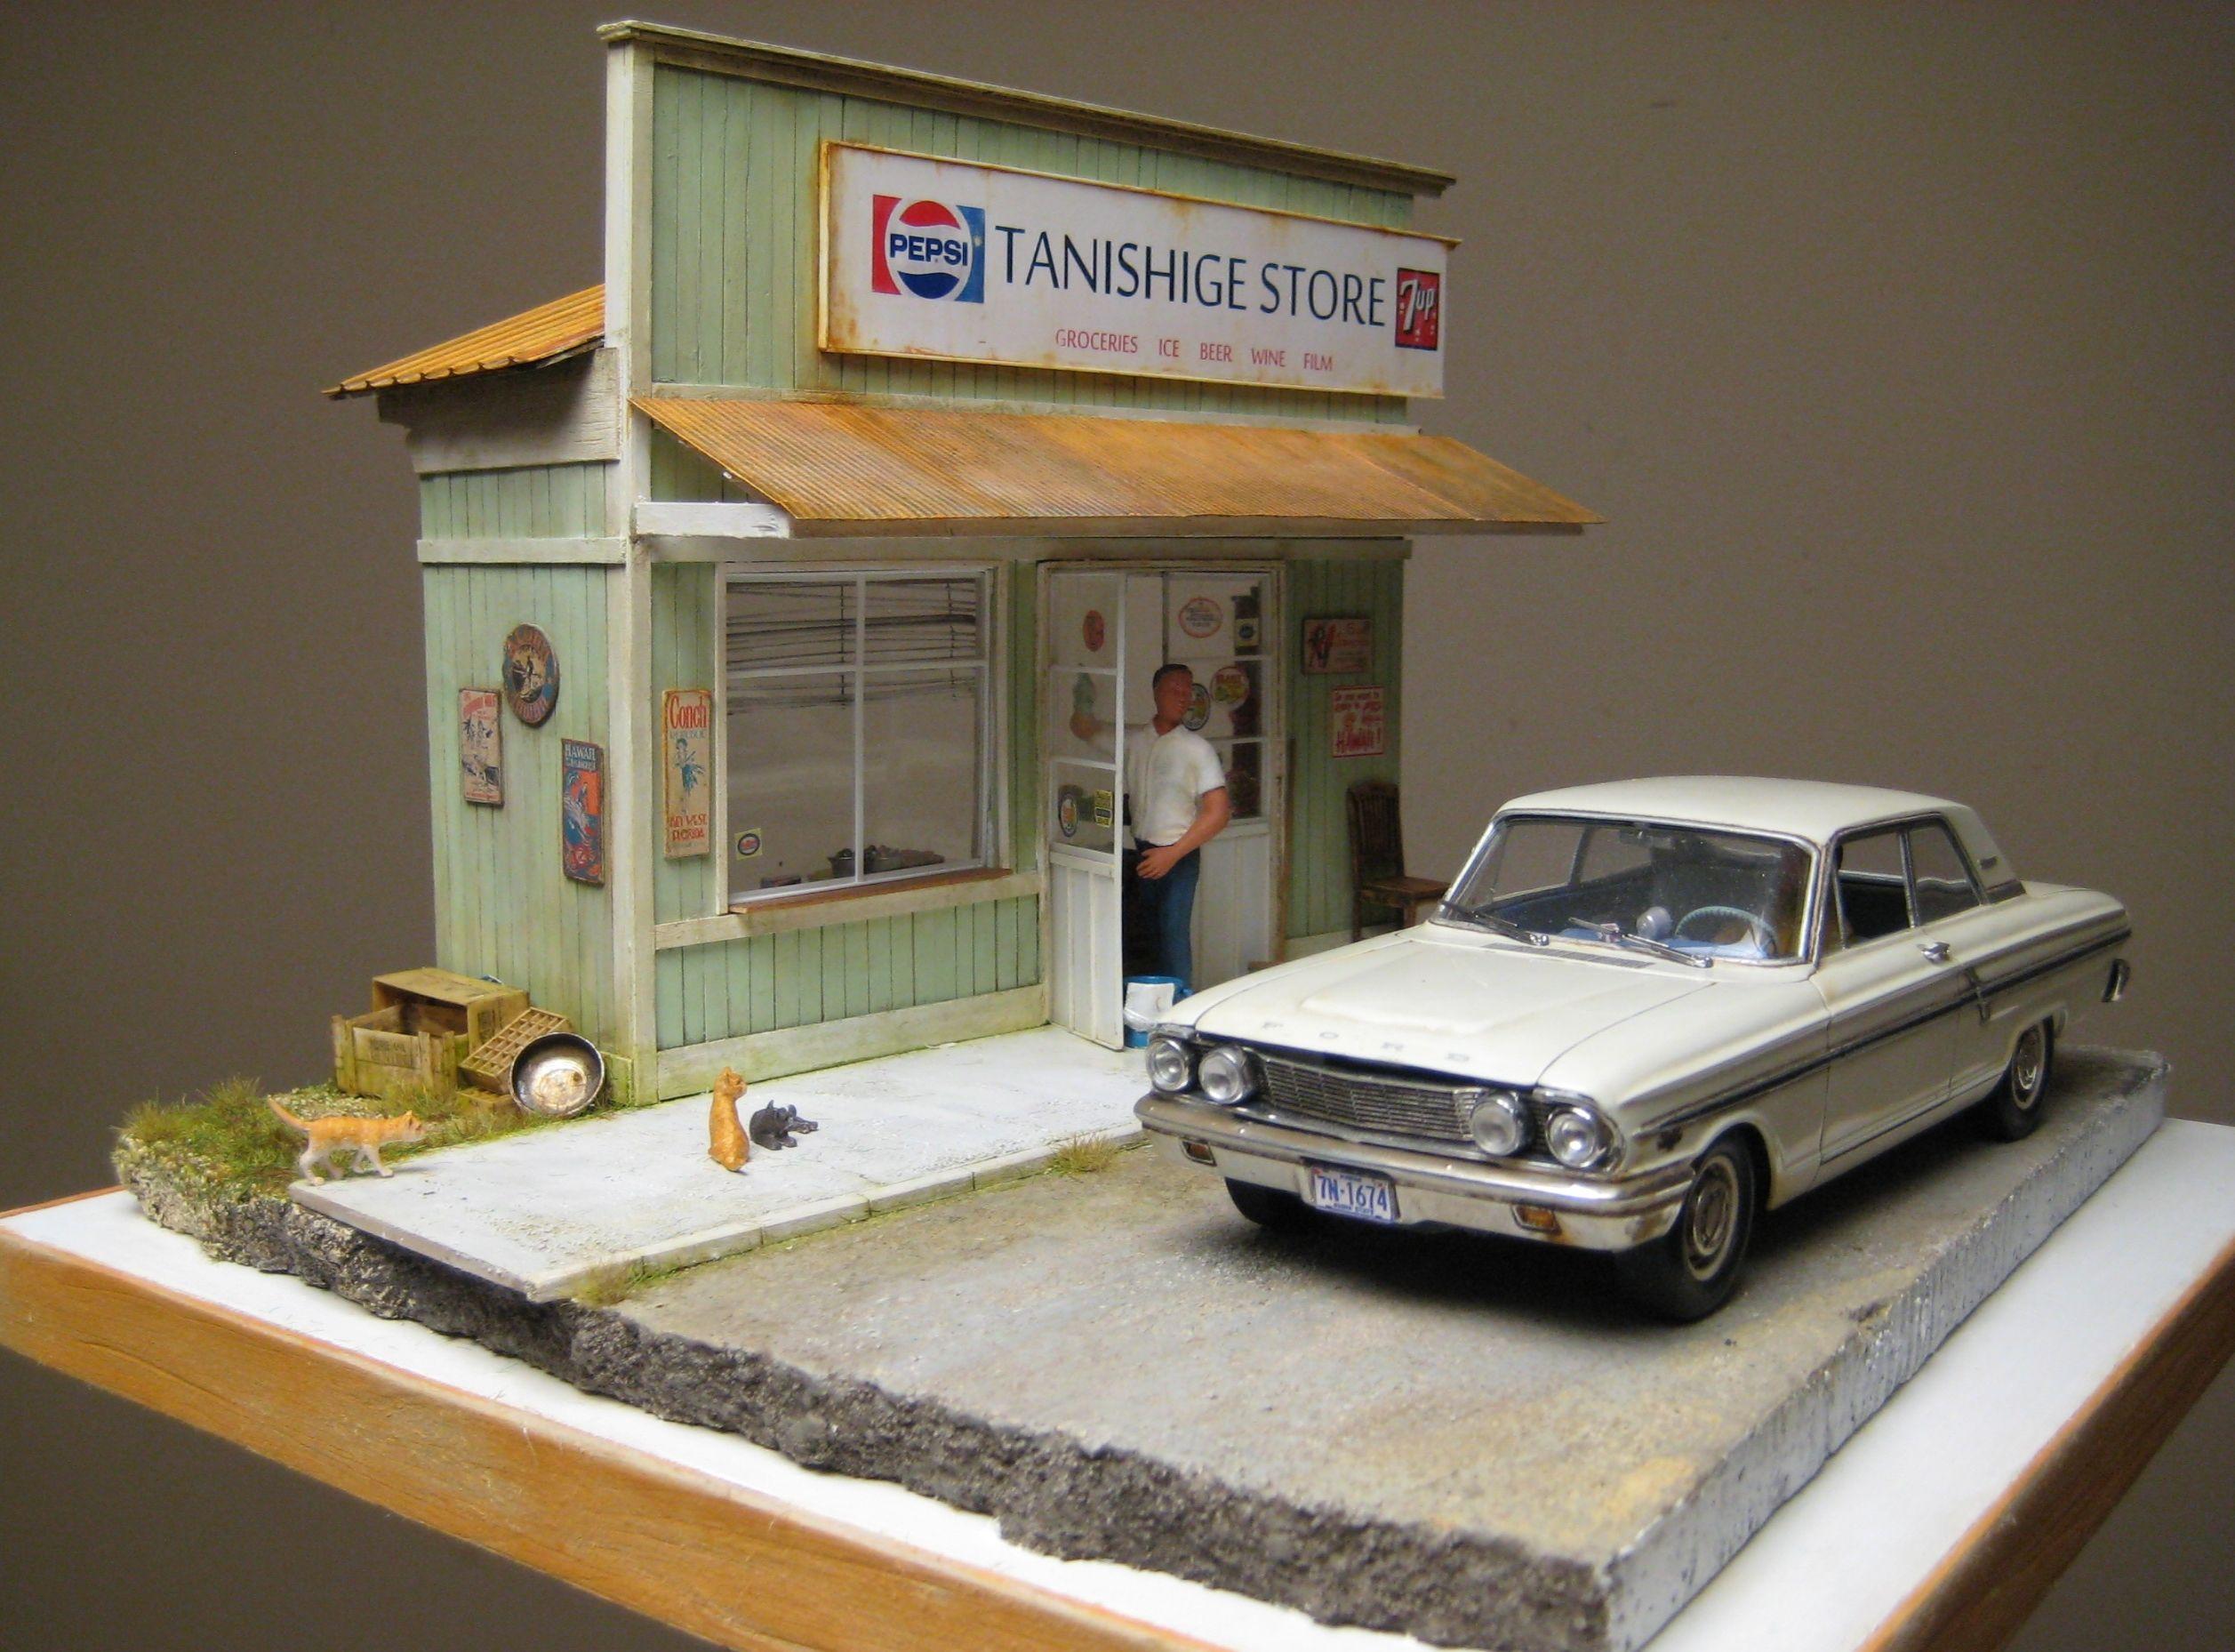 Tanishige Store 1/25 Scale Model Diorama Dioramas